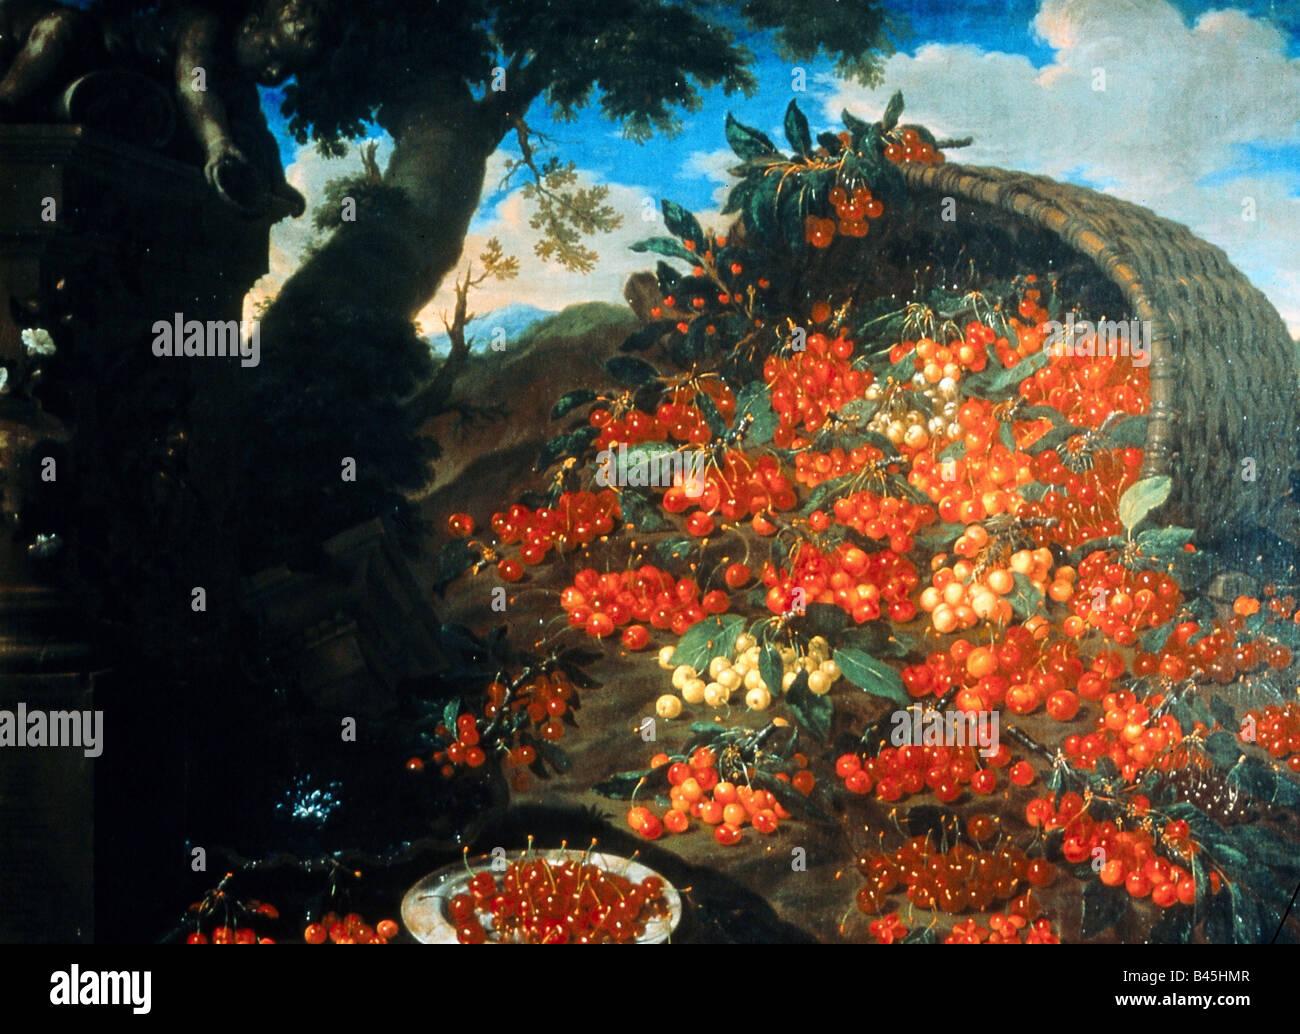 "Bildende Kunst, Bimbi, Bartolomeo (1648-1730), ""vielfältige Varieta di Ciliegie"", Malerei, Öl auf Leinwand, Poggio Stockfoto"